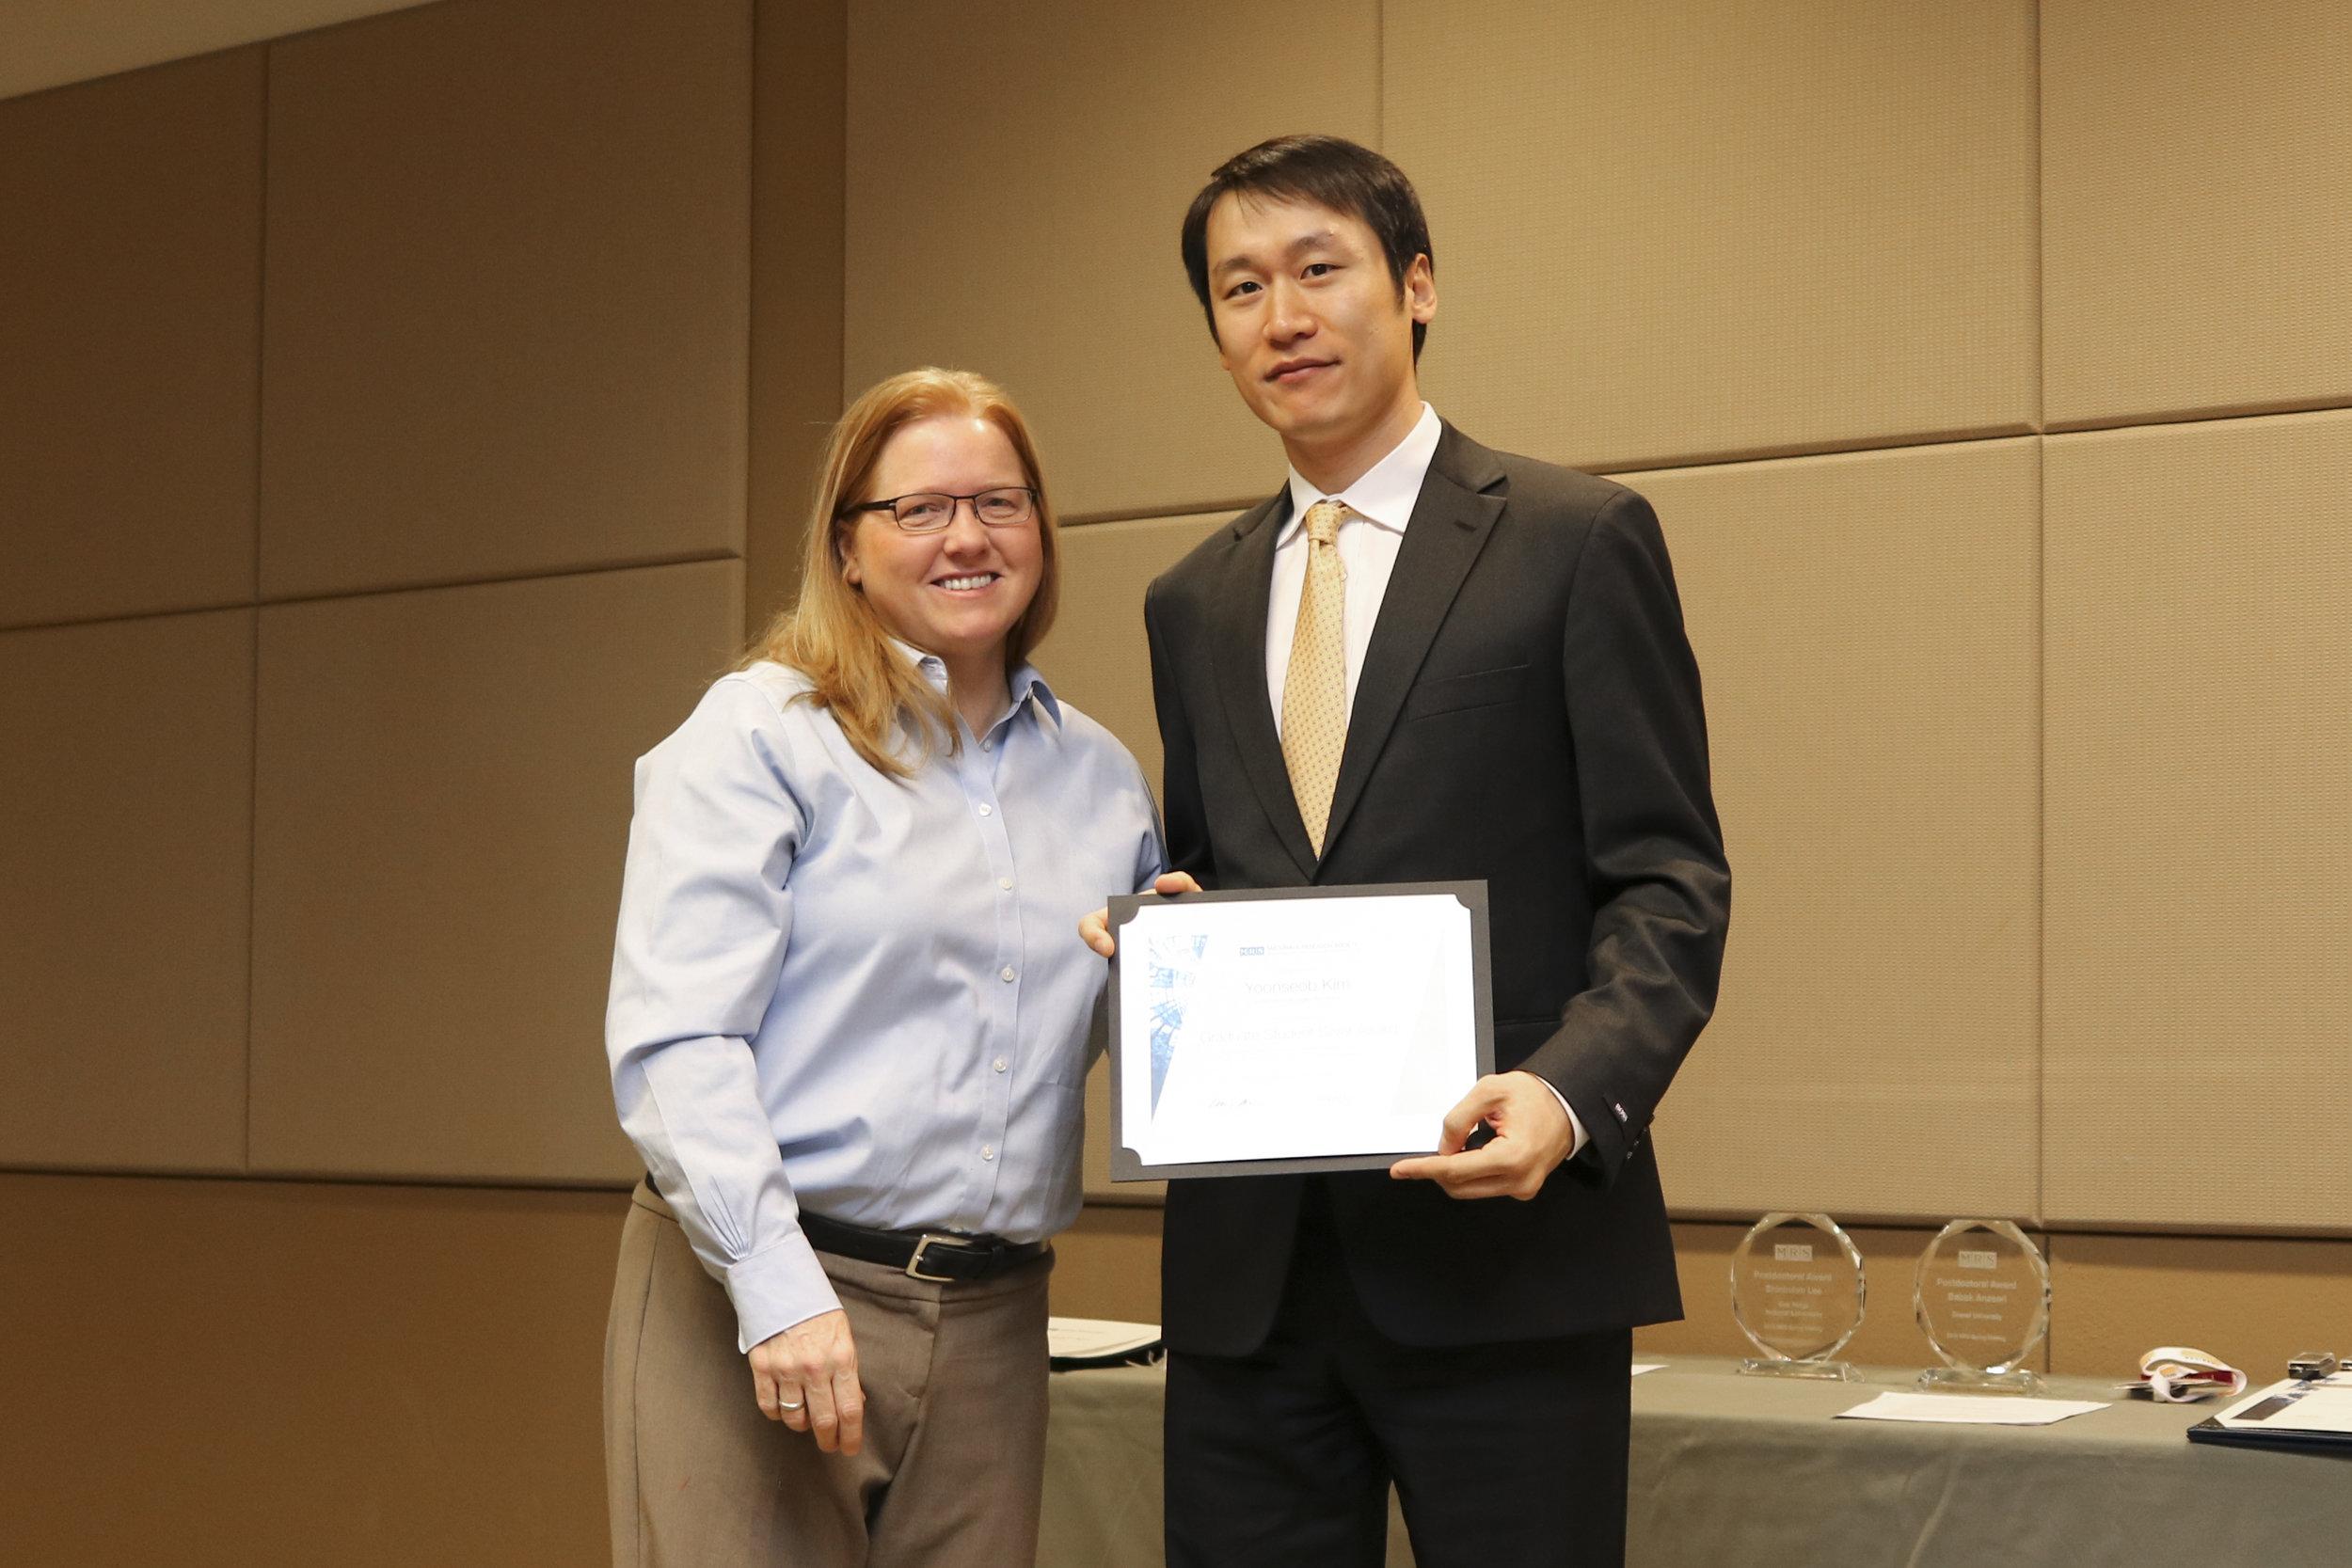 MRS Award - Graduate Student Award, Silver MedalPhoenix, AZ, March 2016